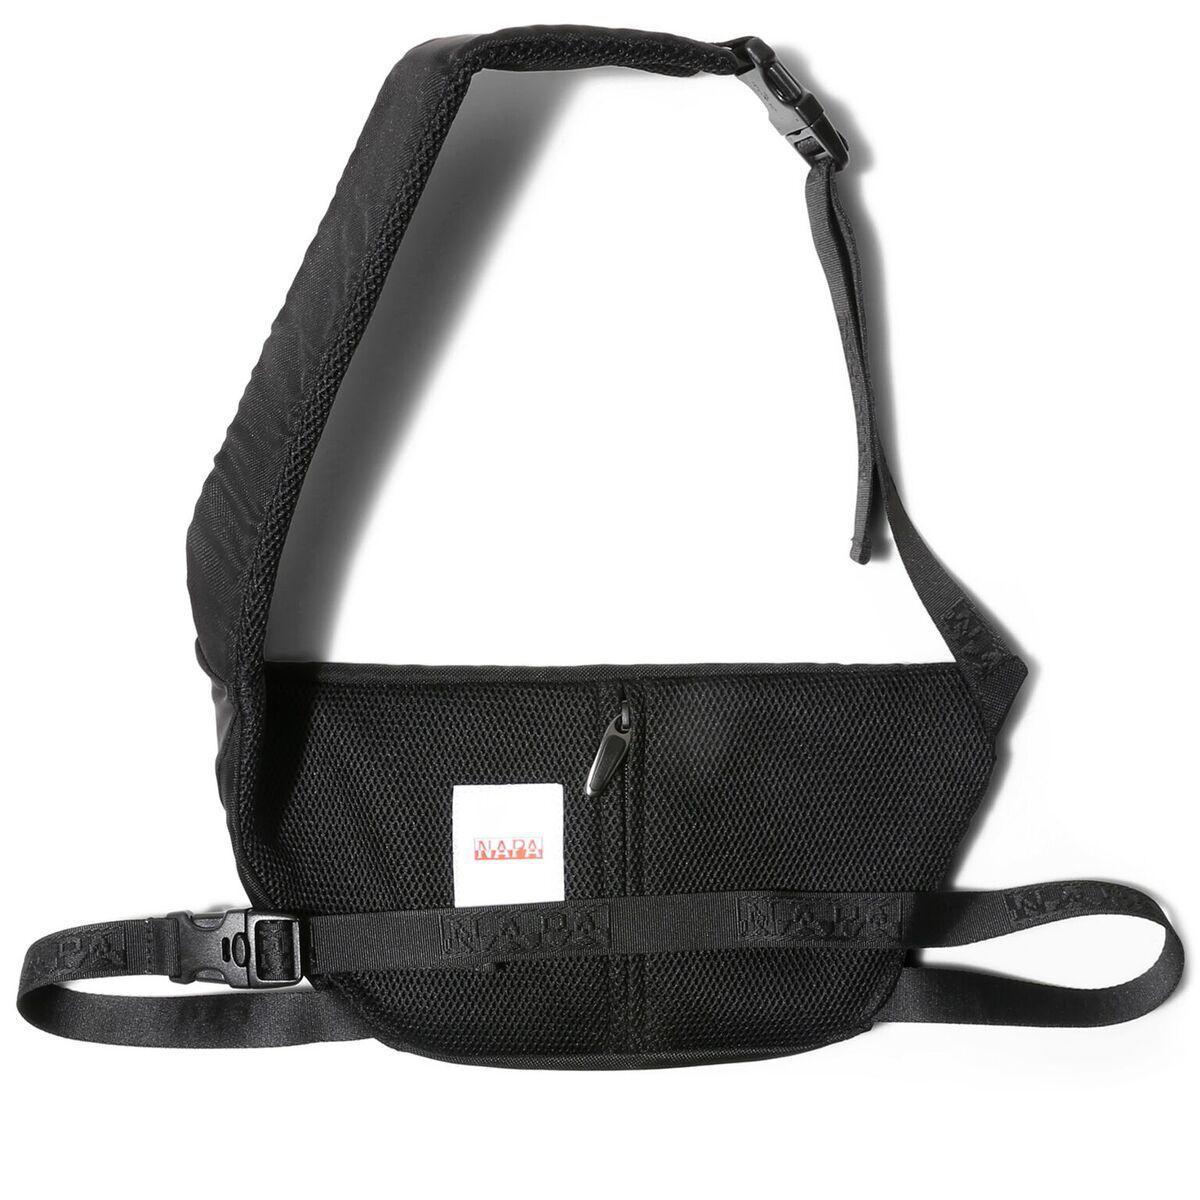 c5c38a906d2f Lyst - Martine Rose H-peric Waist Bag in Black for Men